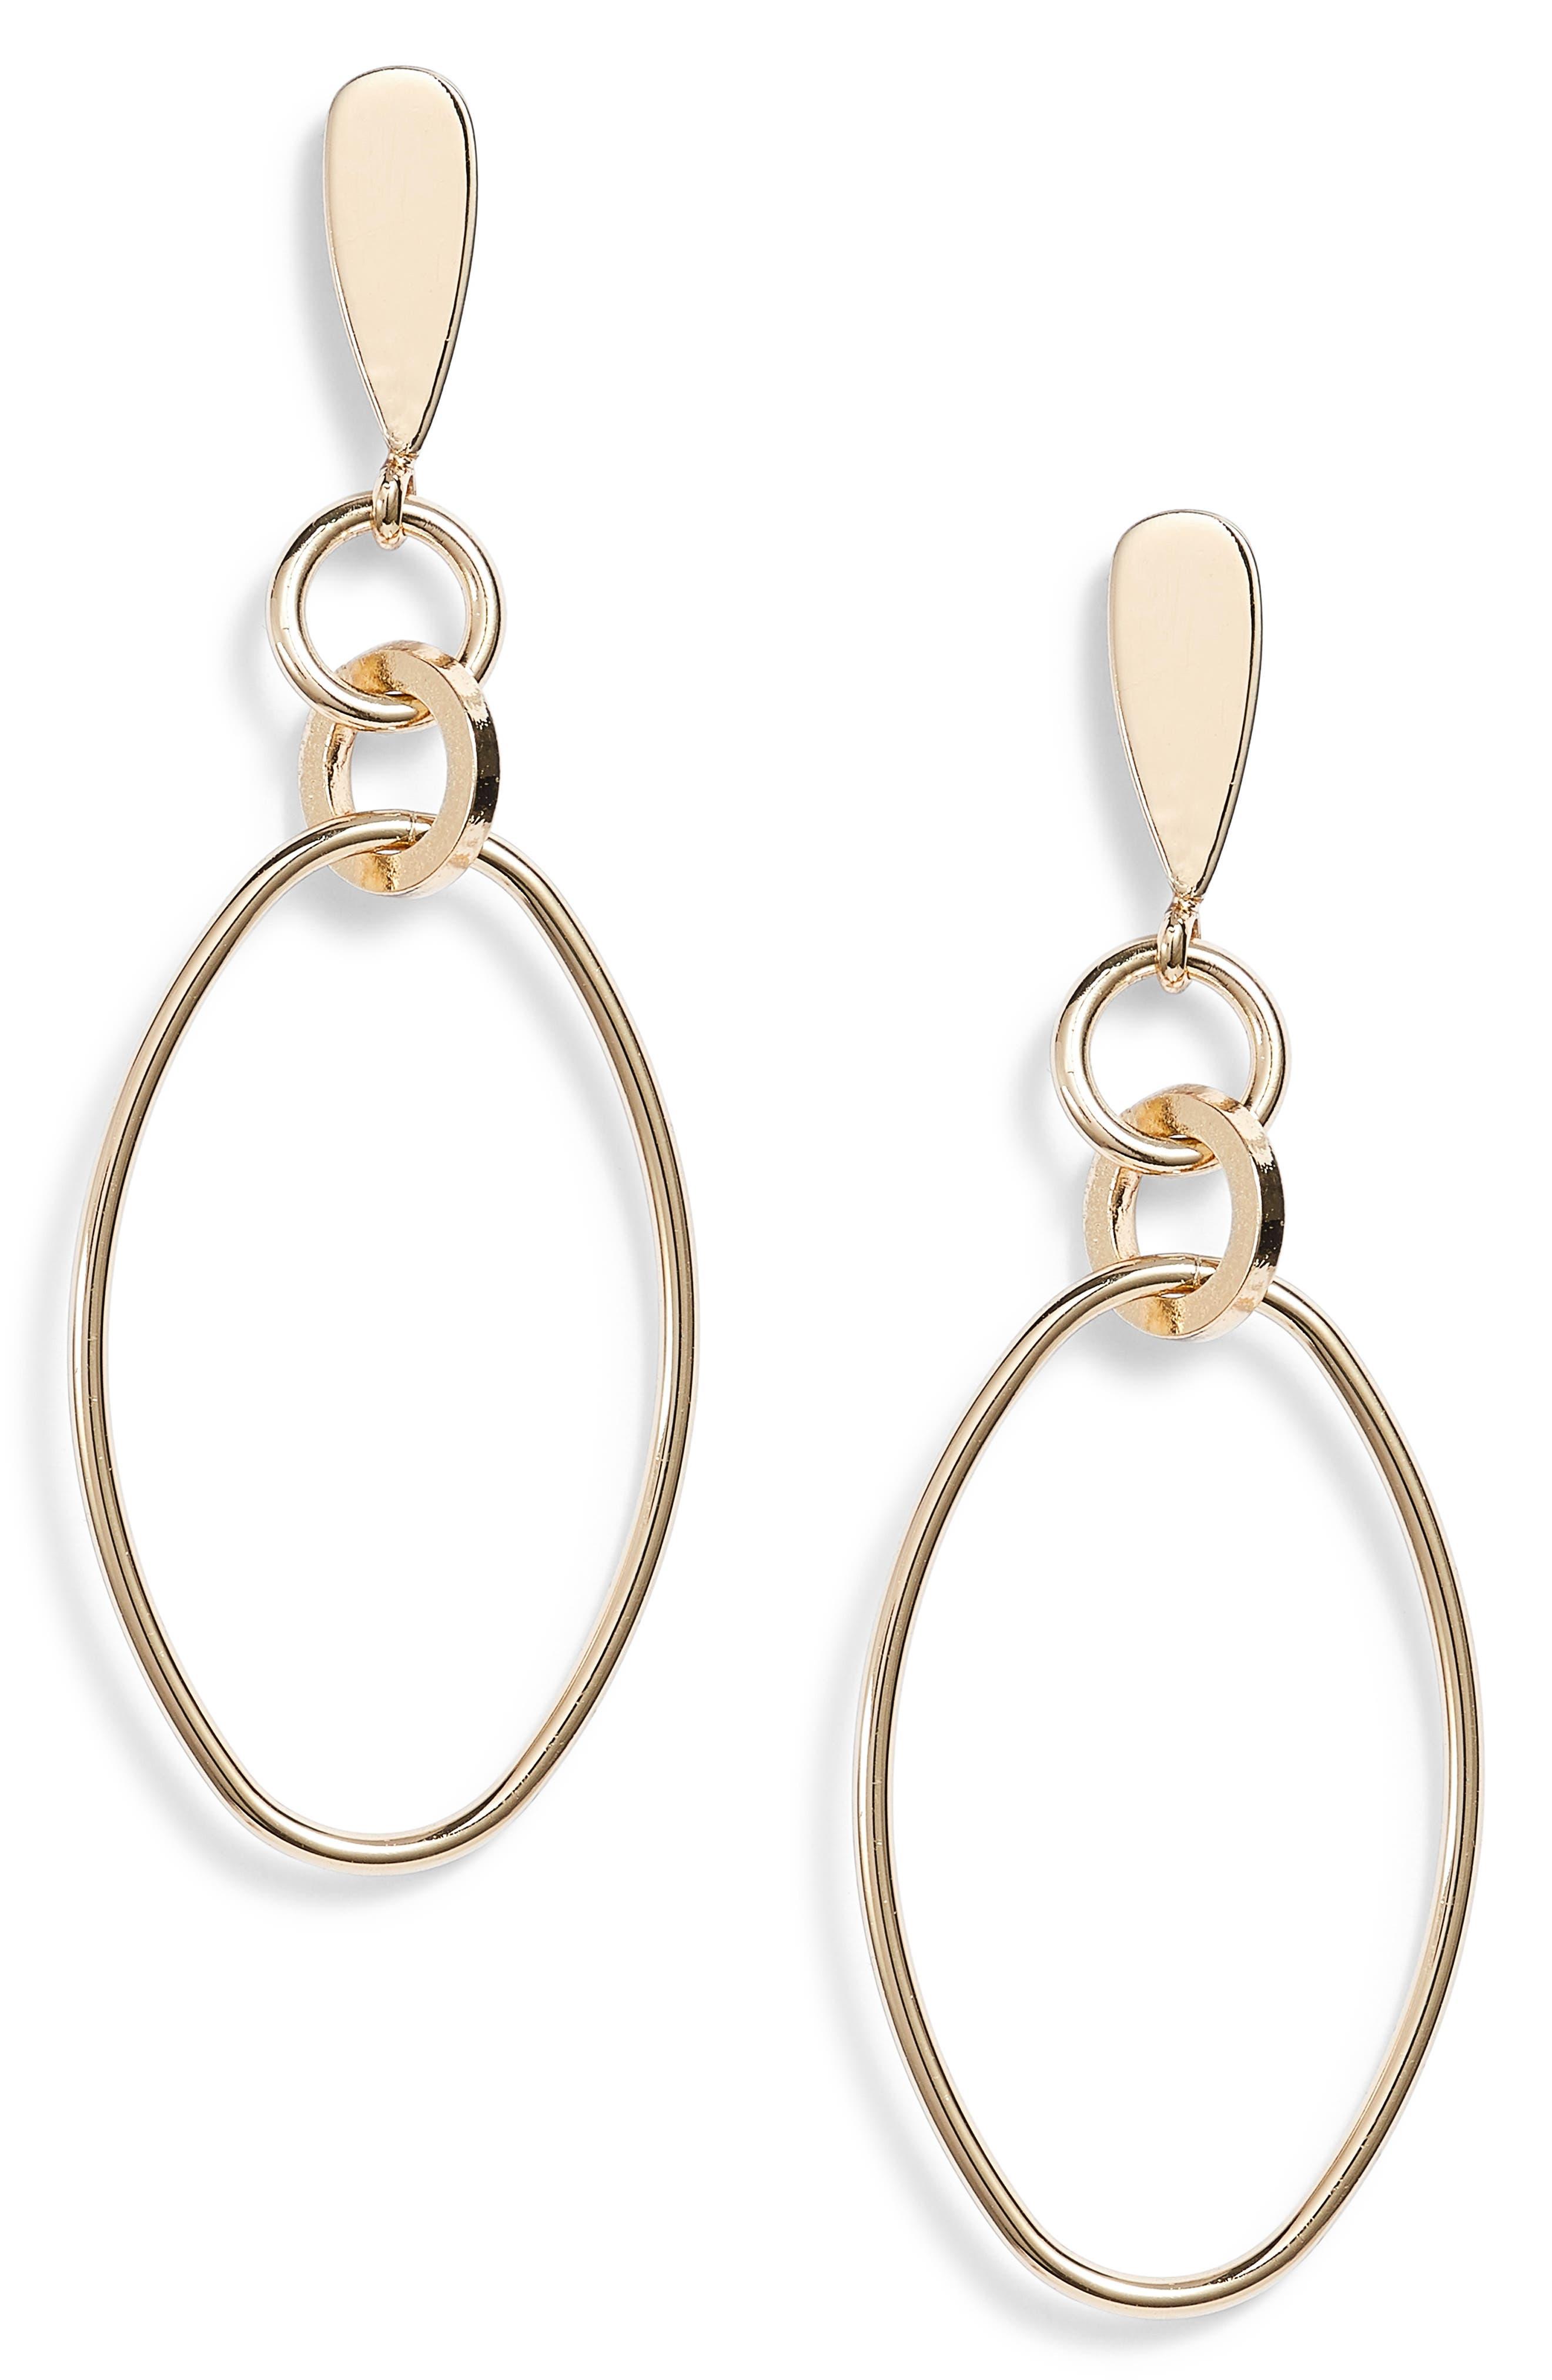 Oval Orbit Front Hoop Earrings,                             Main thumbnail 1, color,                             Gold